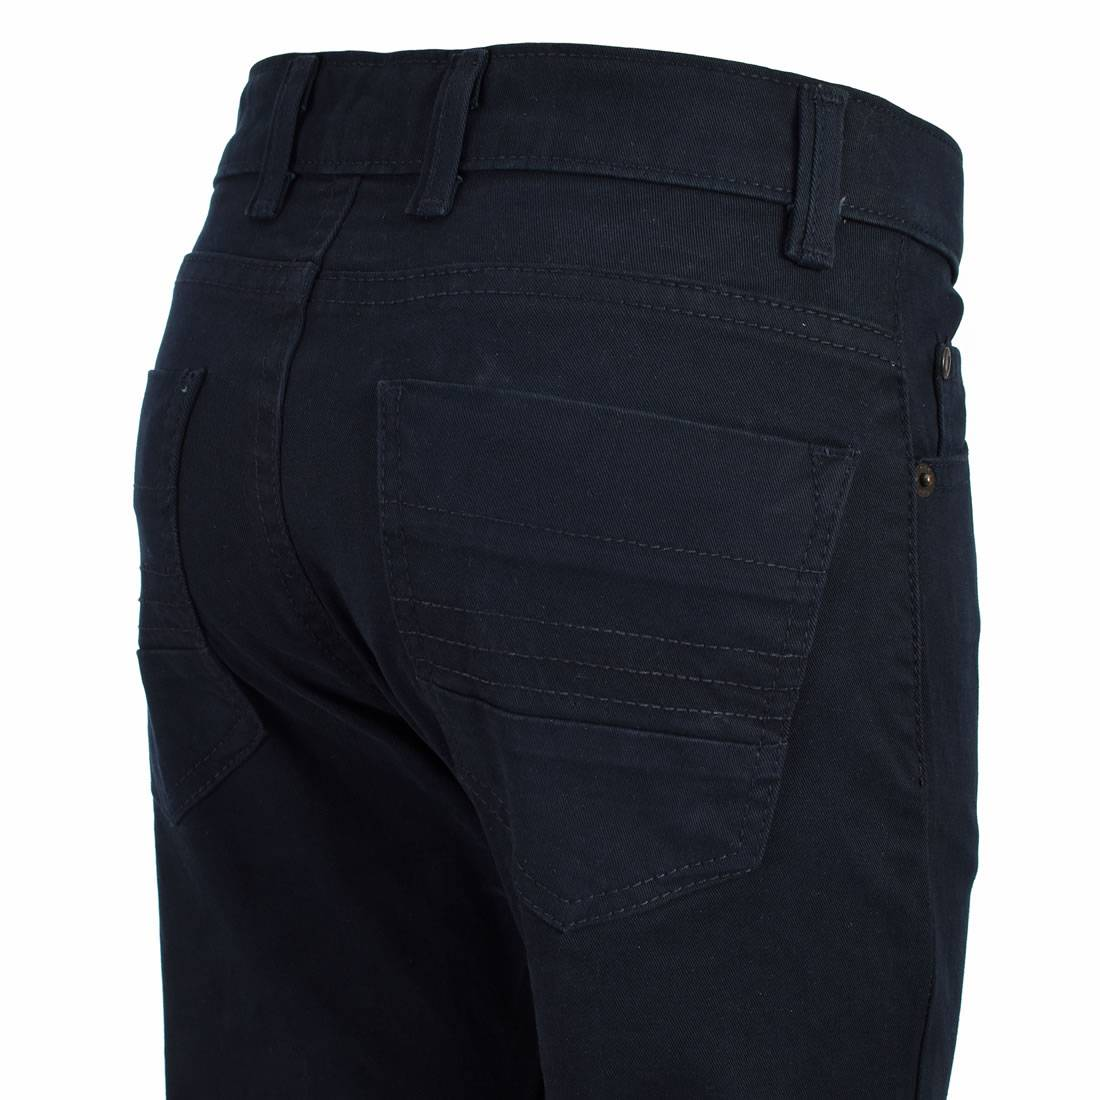 021109065419-04-Pantalon-Vaquero-Boys-Gabardina-Con-Elastano-Skinny-Fit-Cintura-Ajustable-Marino-yale